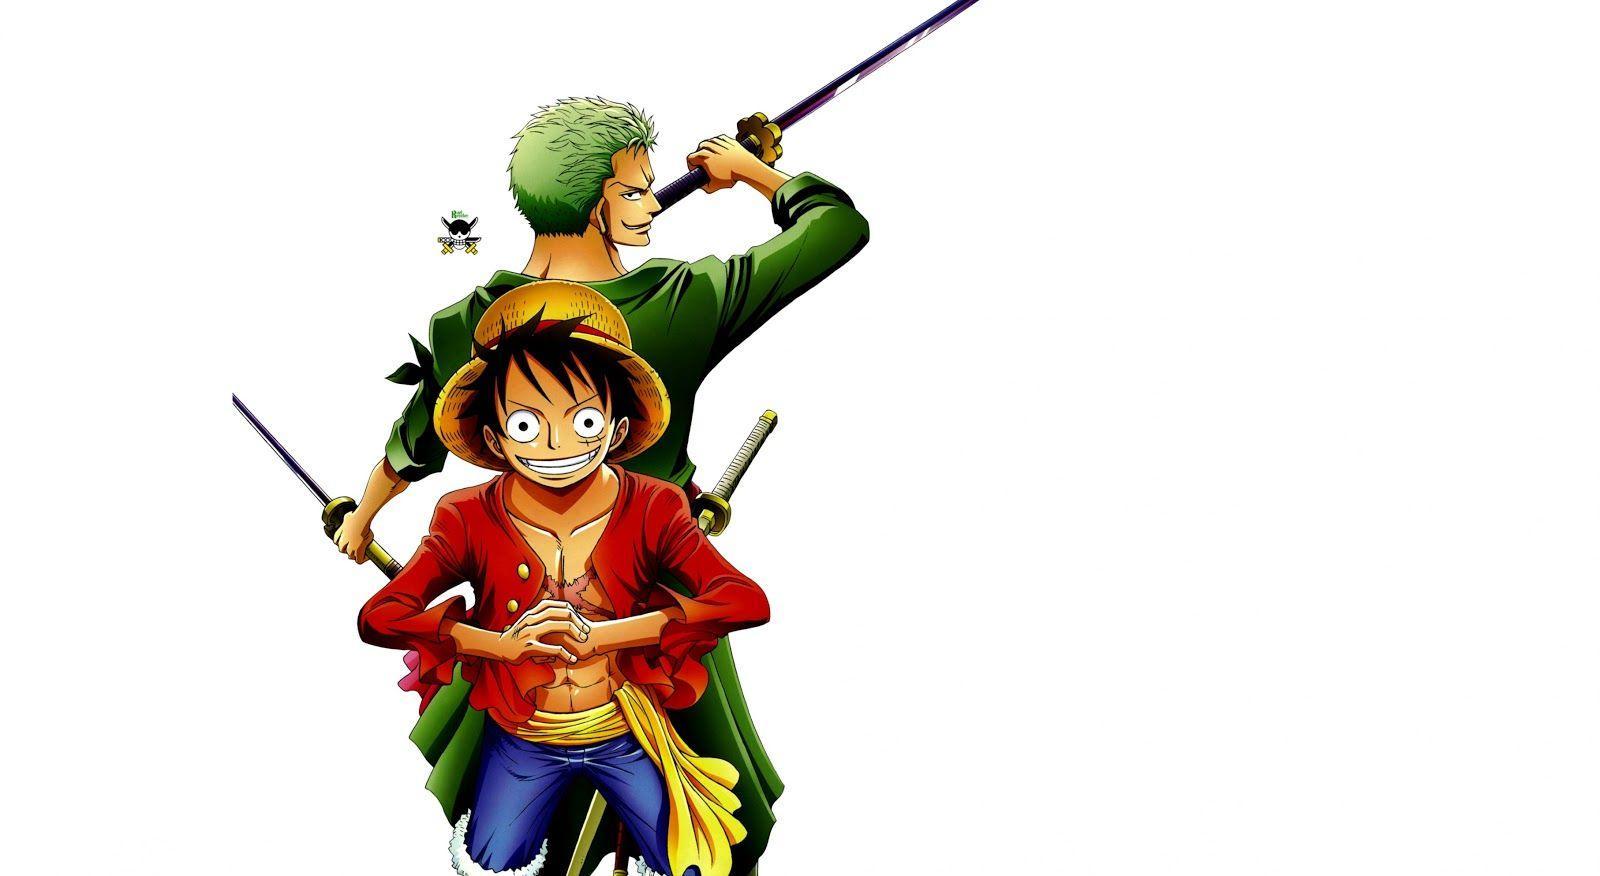 Luffy Zoro Wallpapers Top Free Luffy Zoro Backgrounds